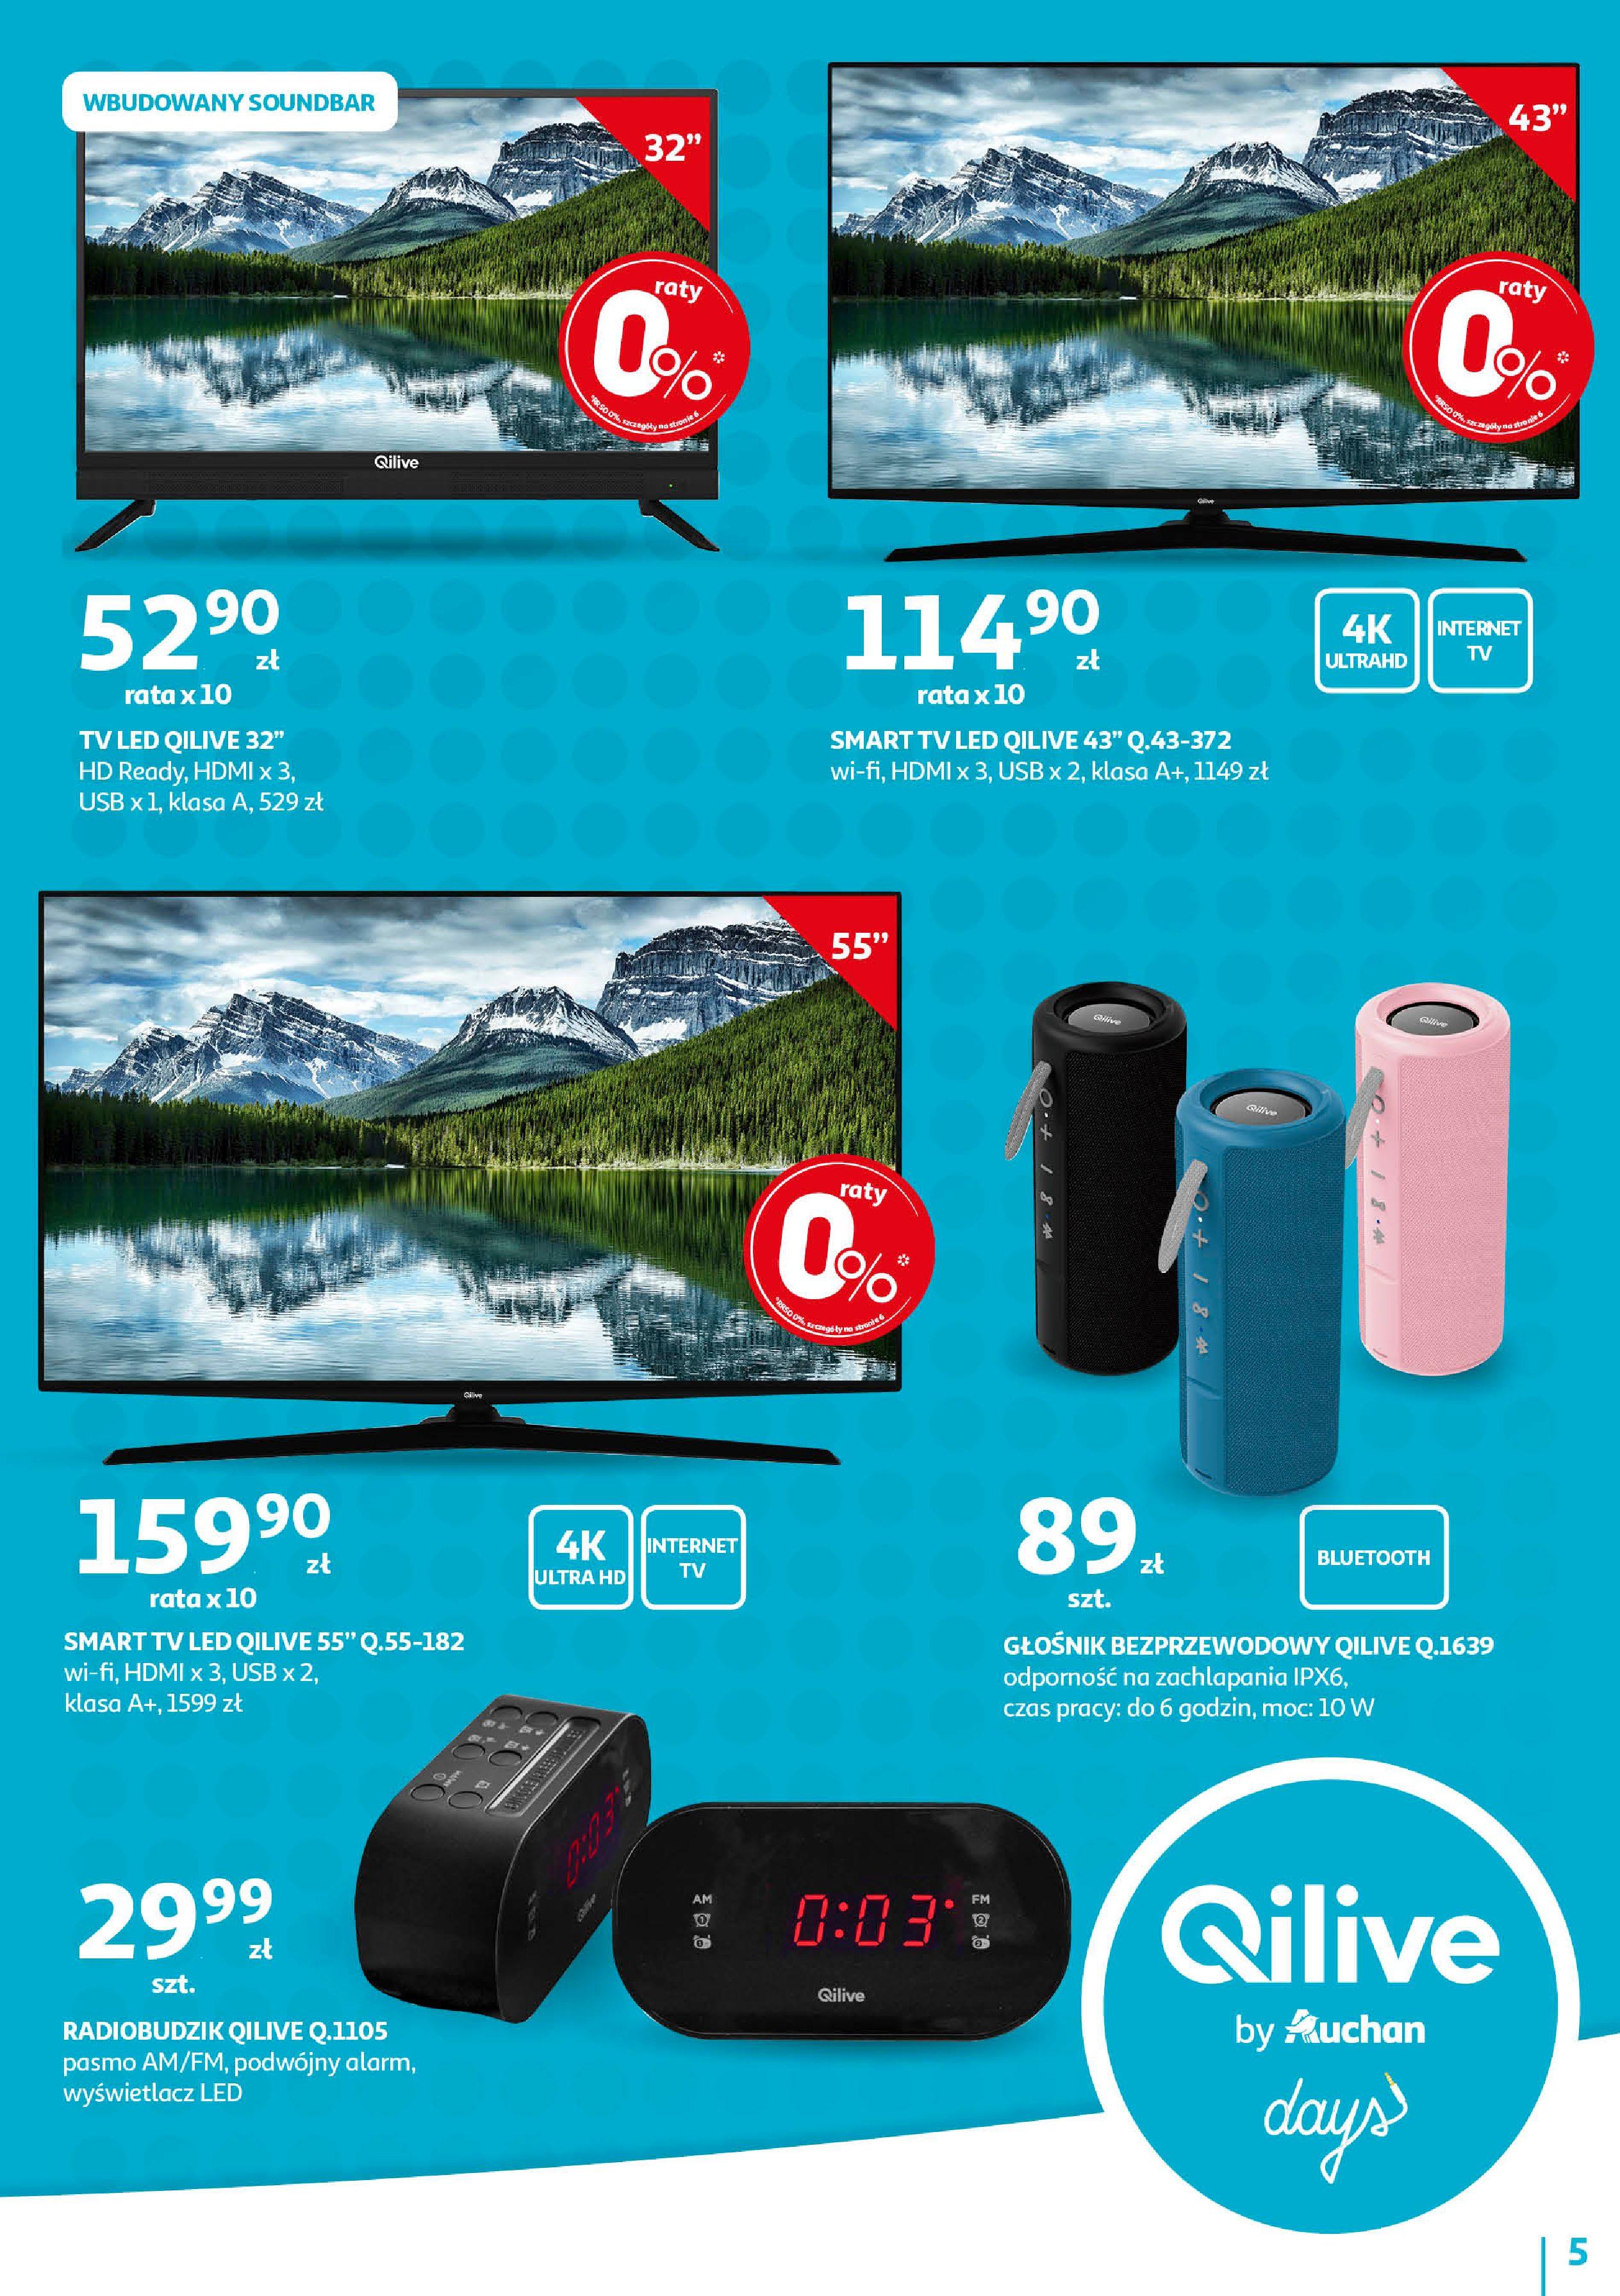 Gazetka Auchan - QILIVE byAuchan days  Hipermarkety-11.09.2019-21.09.2019-page-5